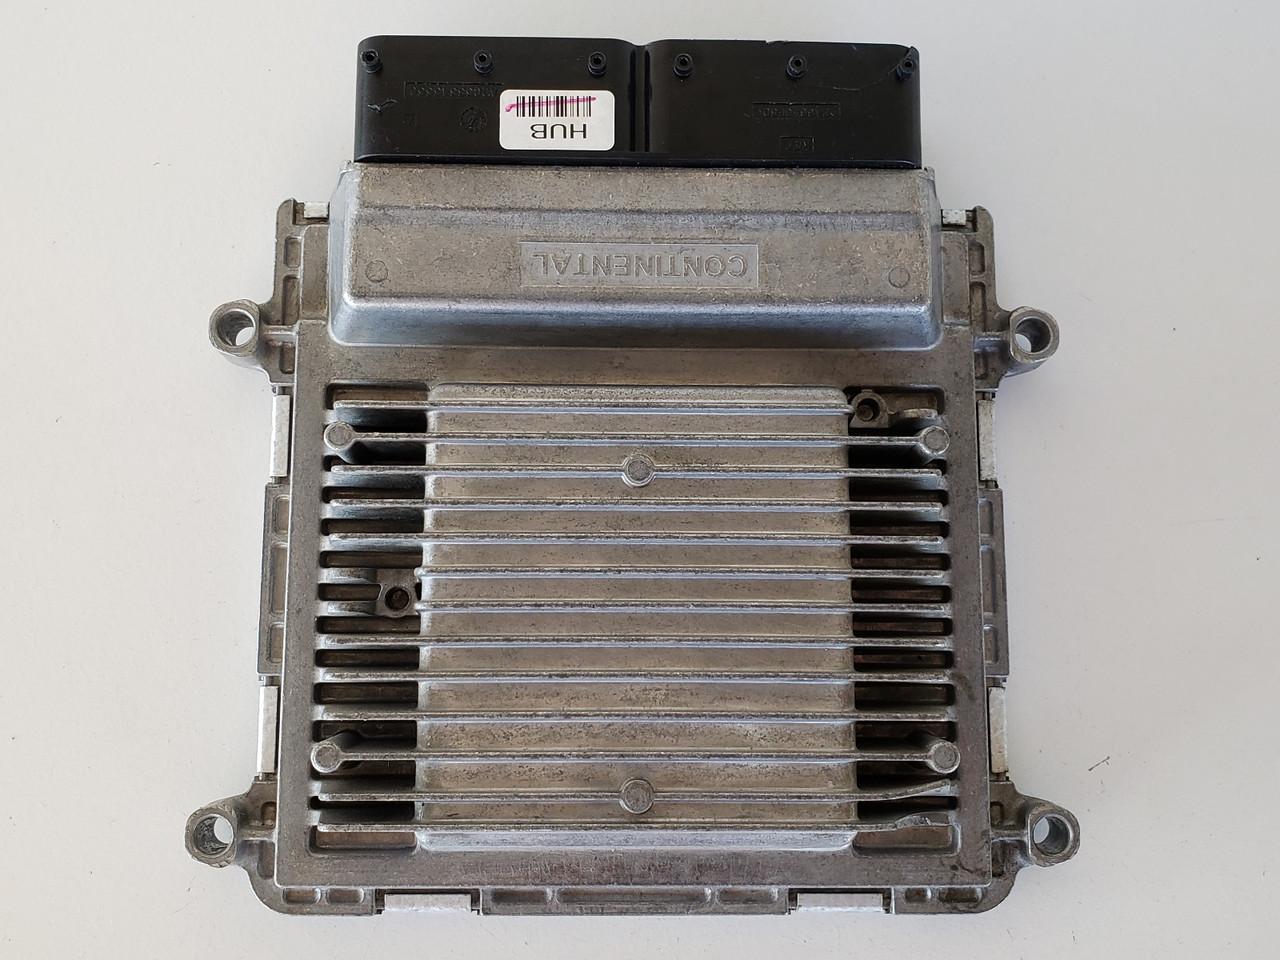 2011-2013 Elantra 39103-2EMB2 Computer Brain Engine Control ECU ECM EBX Module